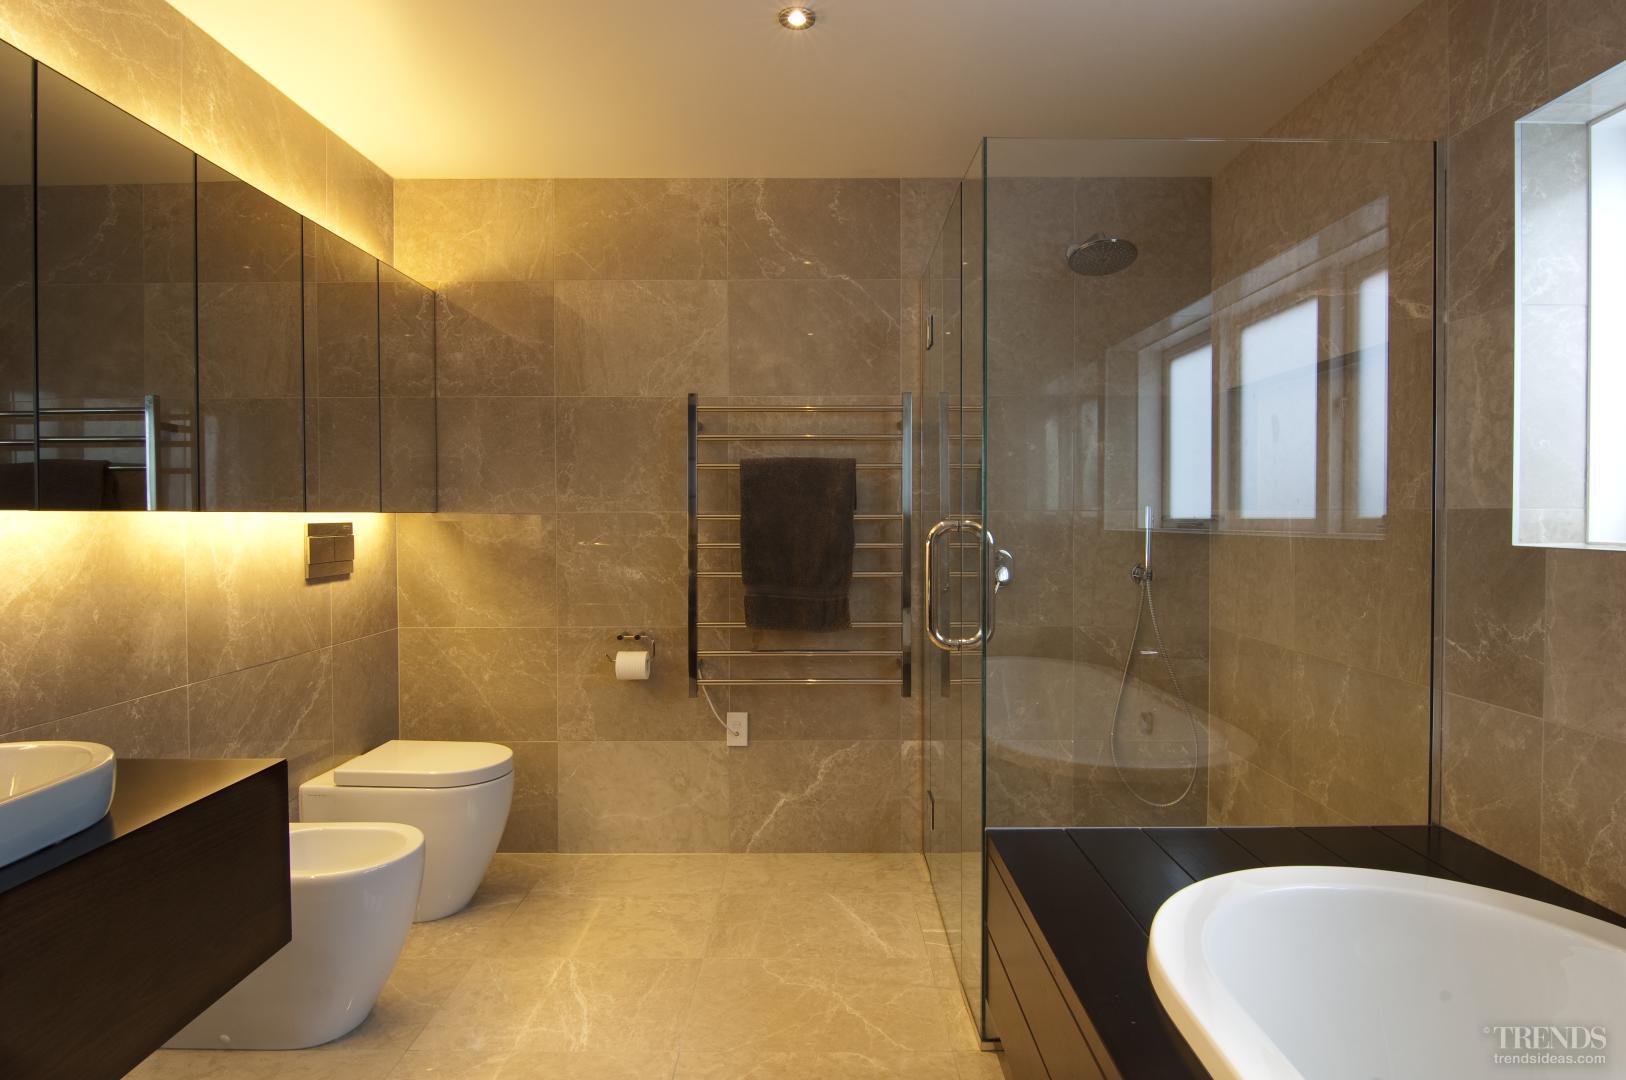 Spa like bathroom remodel by craig fafeita - Cool spa like bathroom designs ...